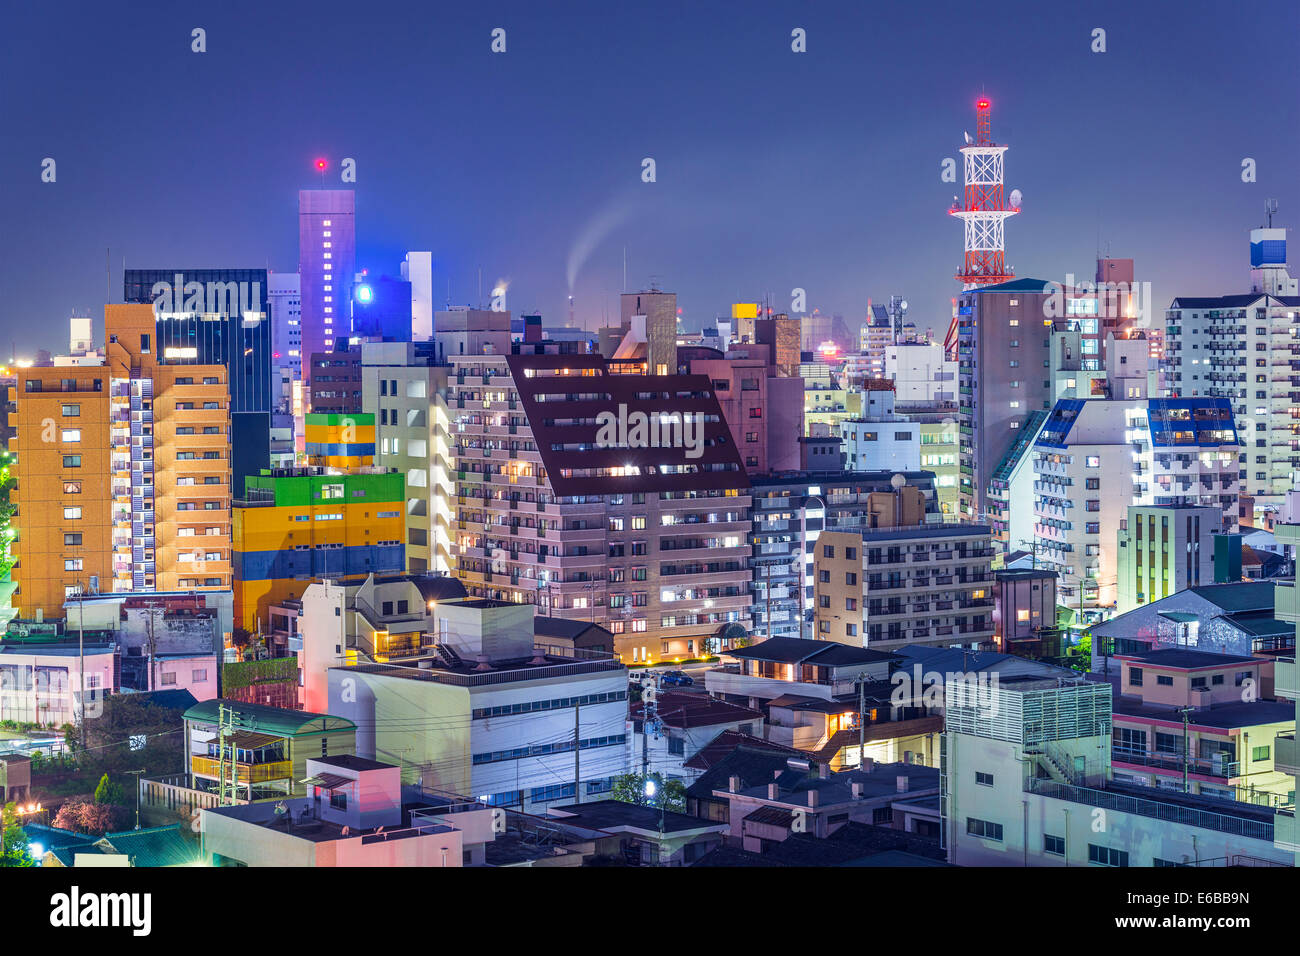 Wakayama, Giappone downtown cityscape. Immagini Stock